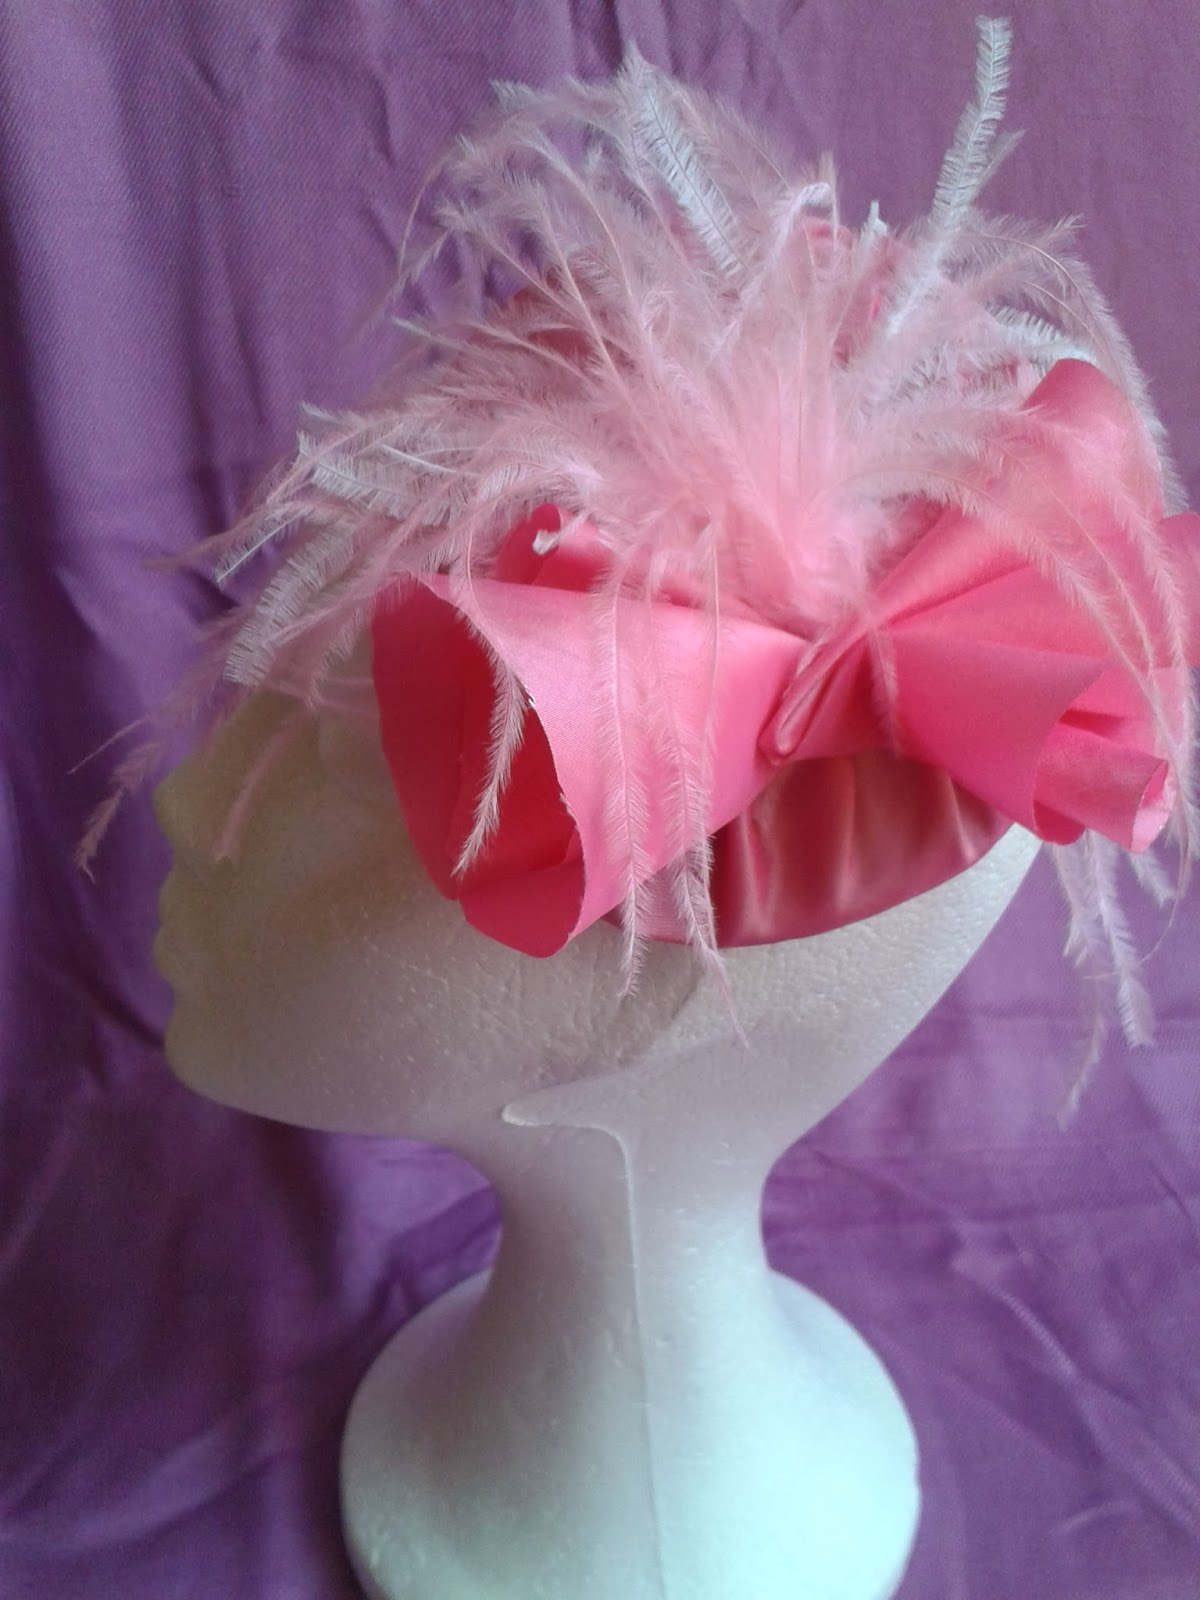 tocados baratos, tocados para bodas, tocados económicos, tocado rosa, tocado seda salvaje, tocado con plumas, plumas de avestruz